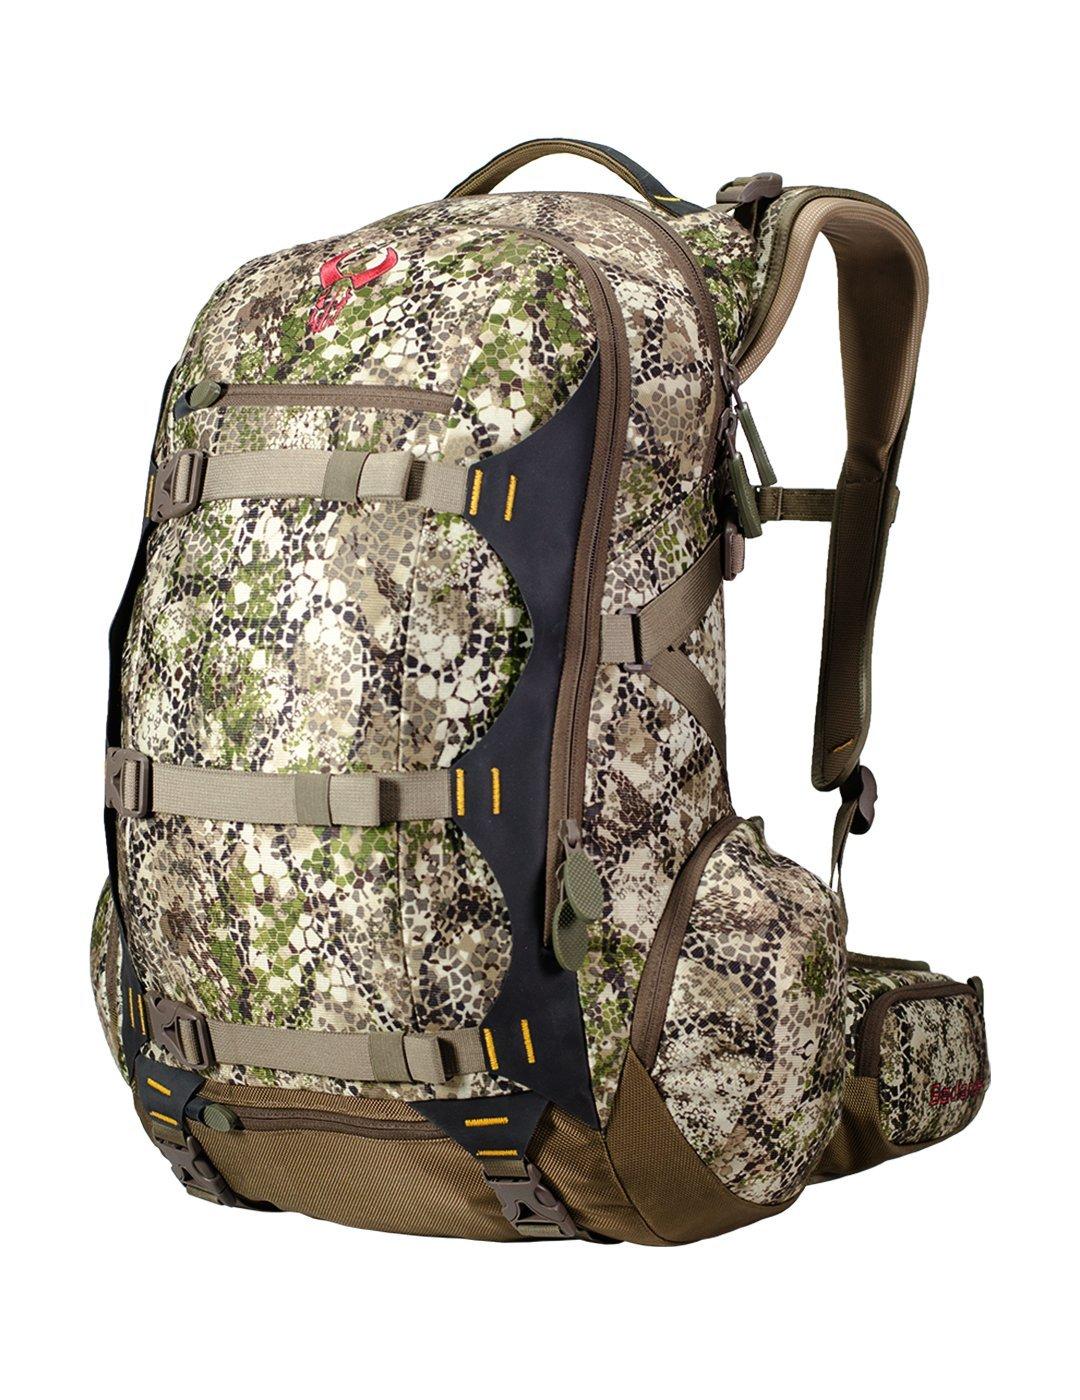 Badlands Camouflage Hunting Pack